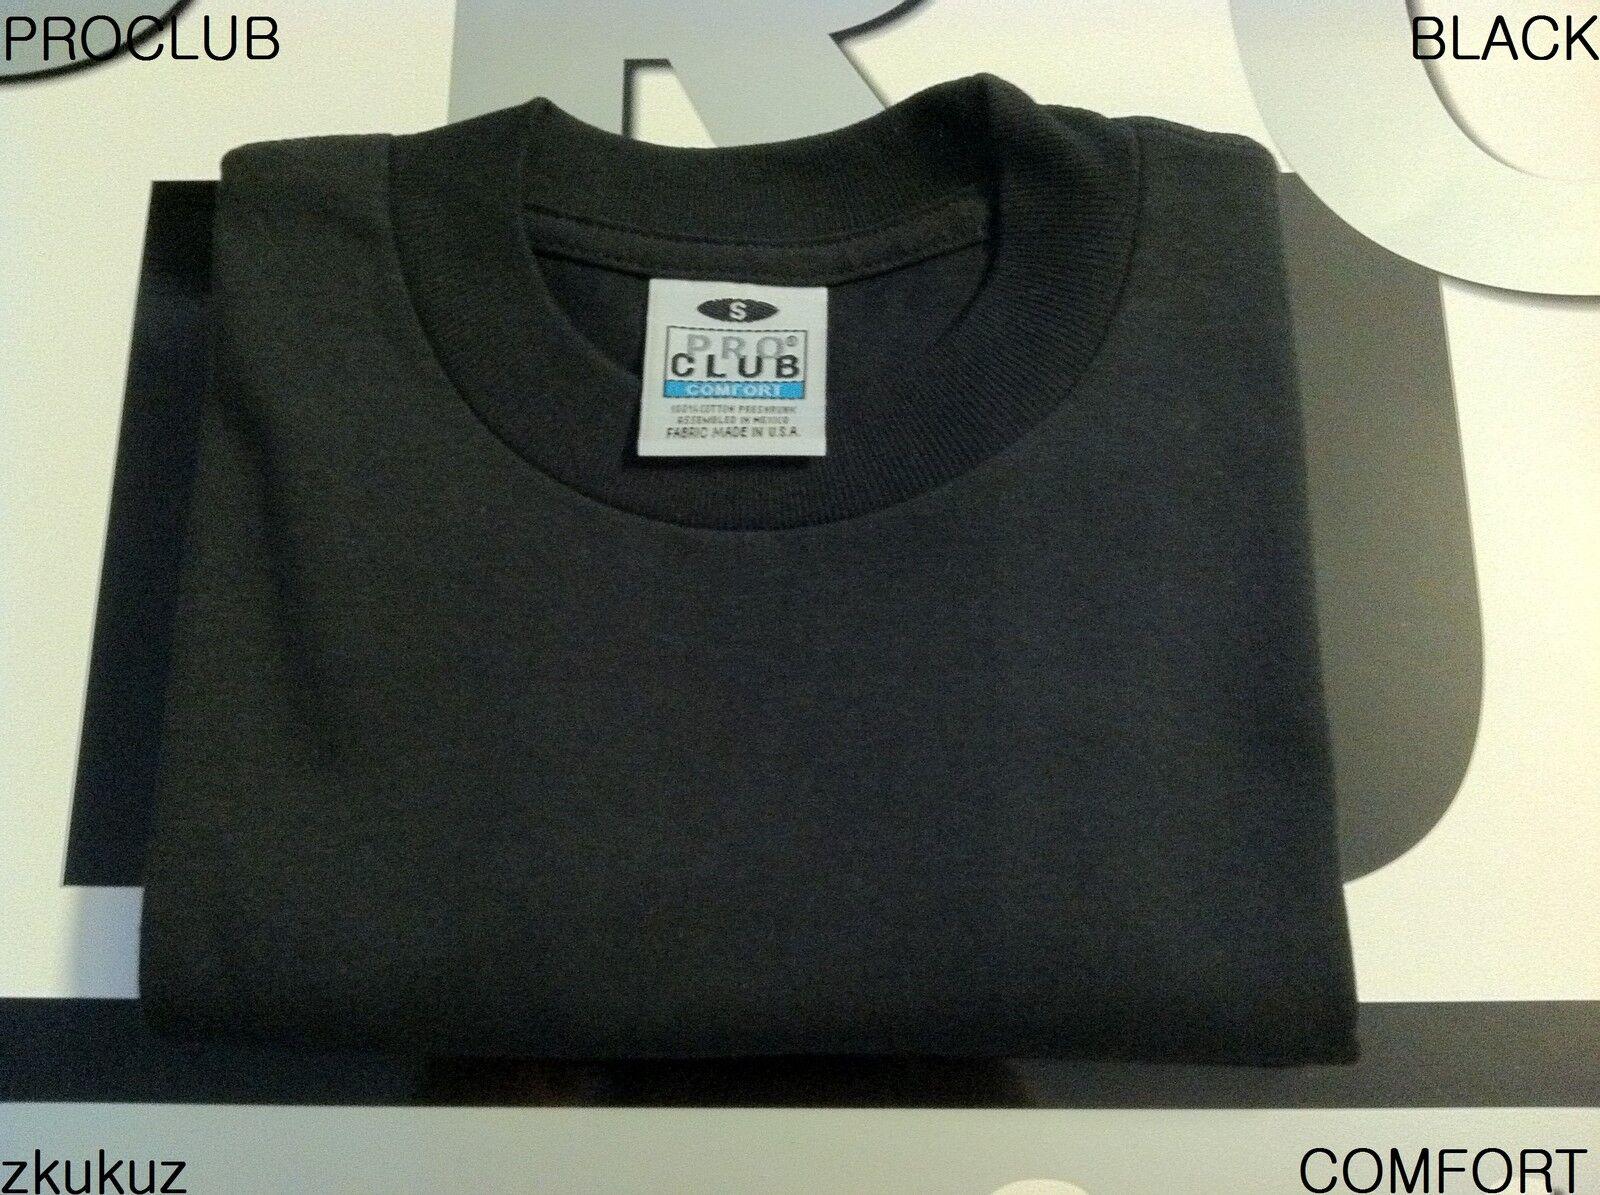 556d8ac5 Pro Club Heavyweight T Shirts Near Me